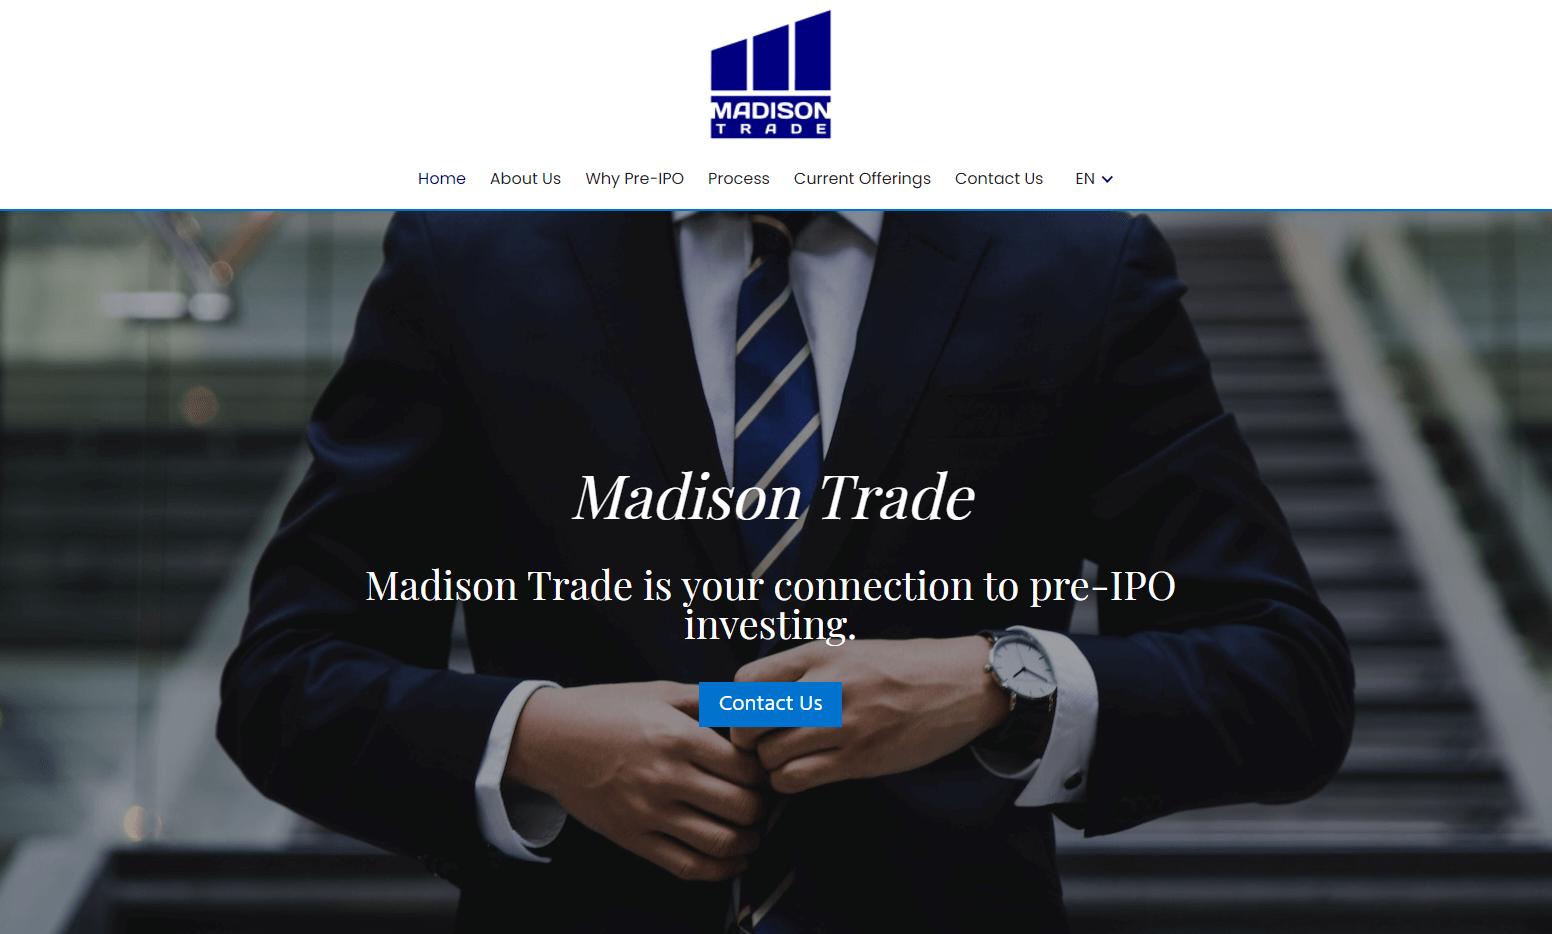 Madison Trade